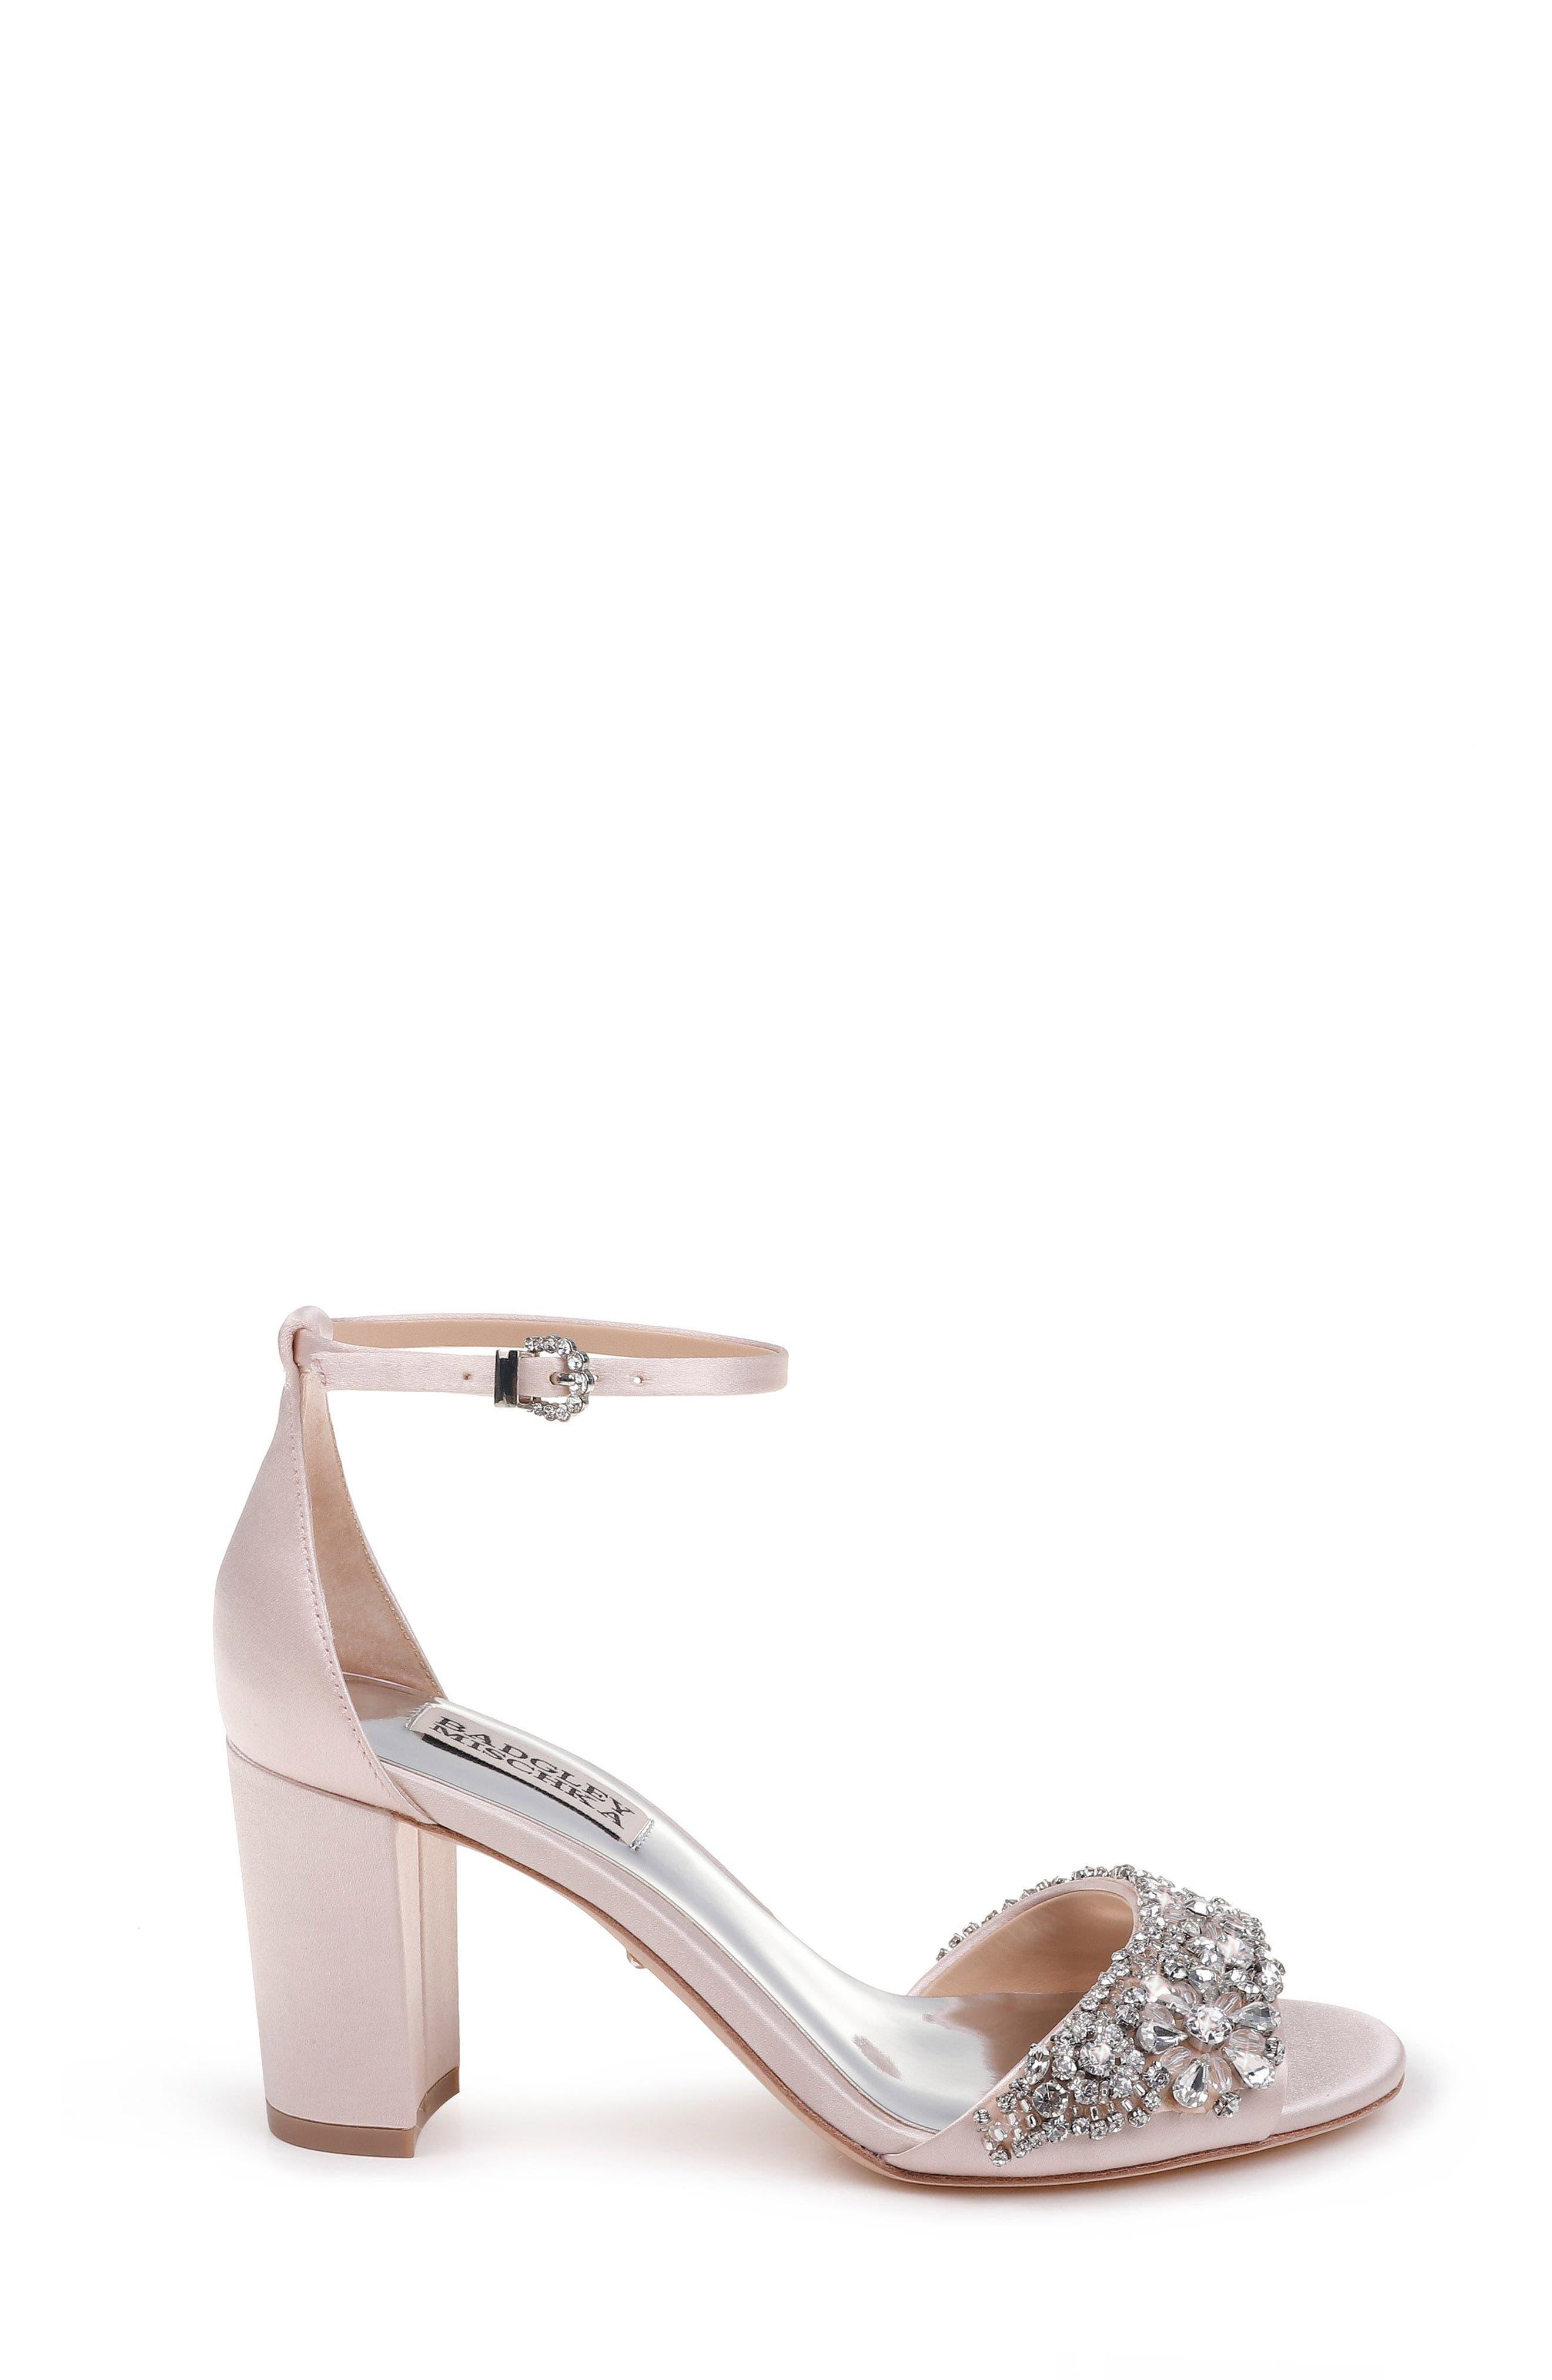 Alternate Image 3  - Badgley Mischka Hines Embellished Block Heel Sandal (Women)